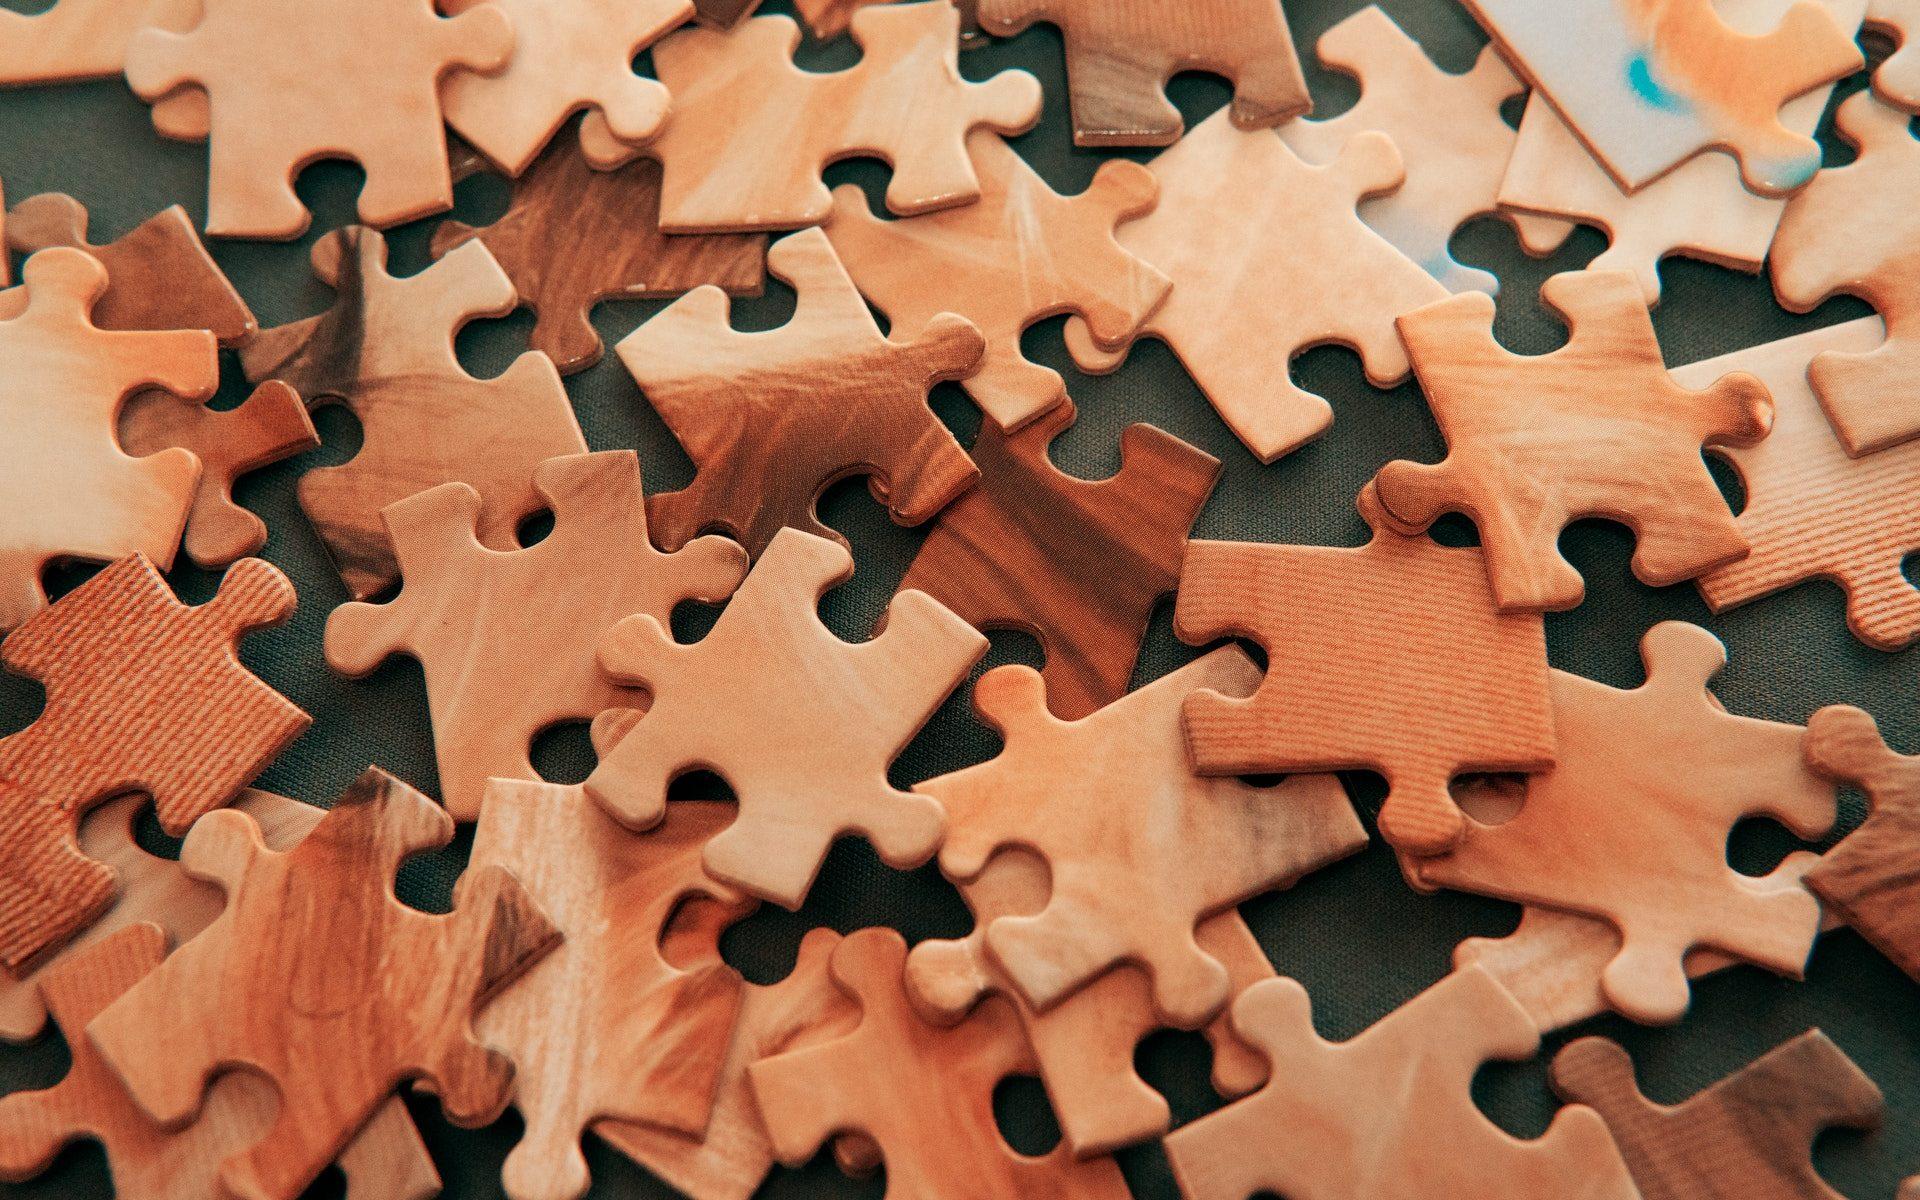 Eurofondy puzzle